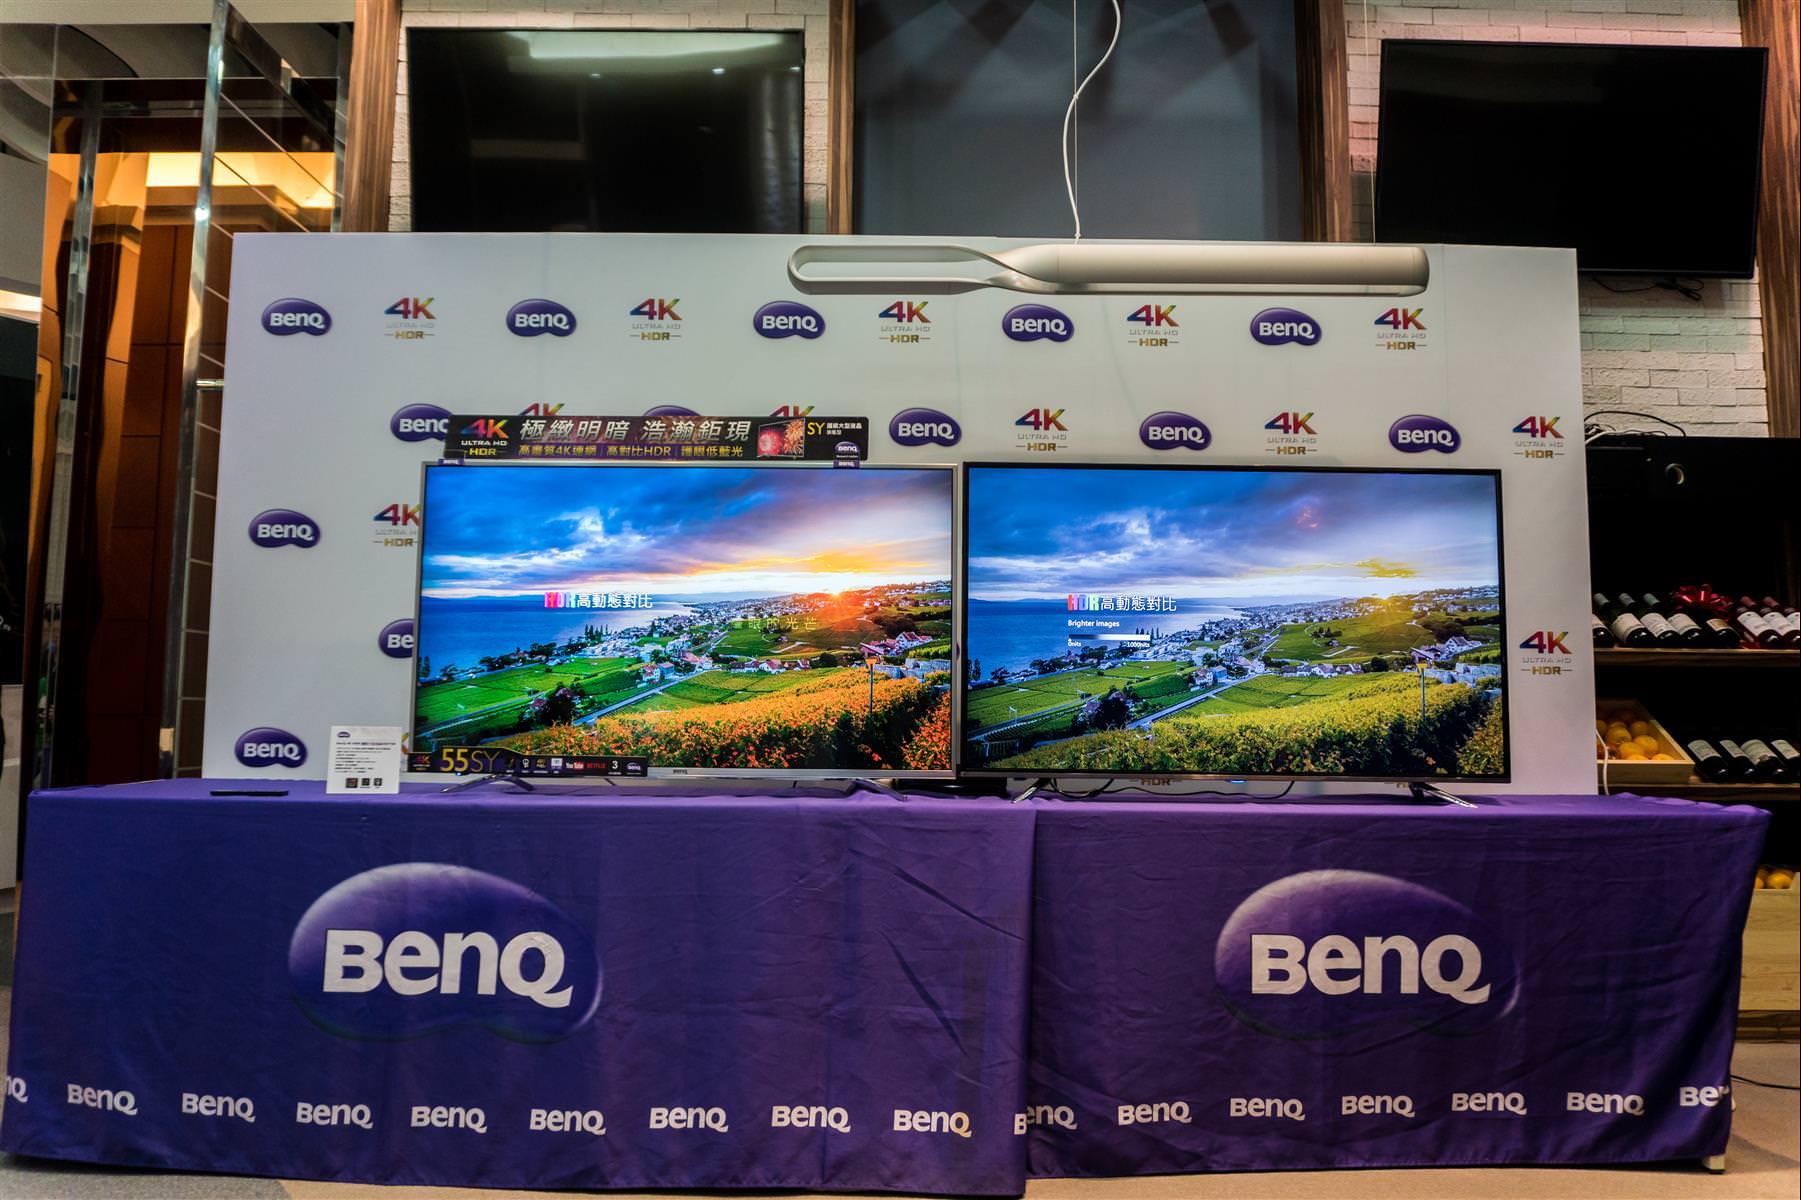 BenQ 4K HDR